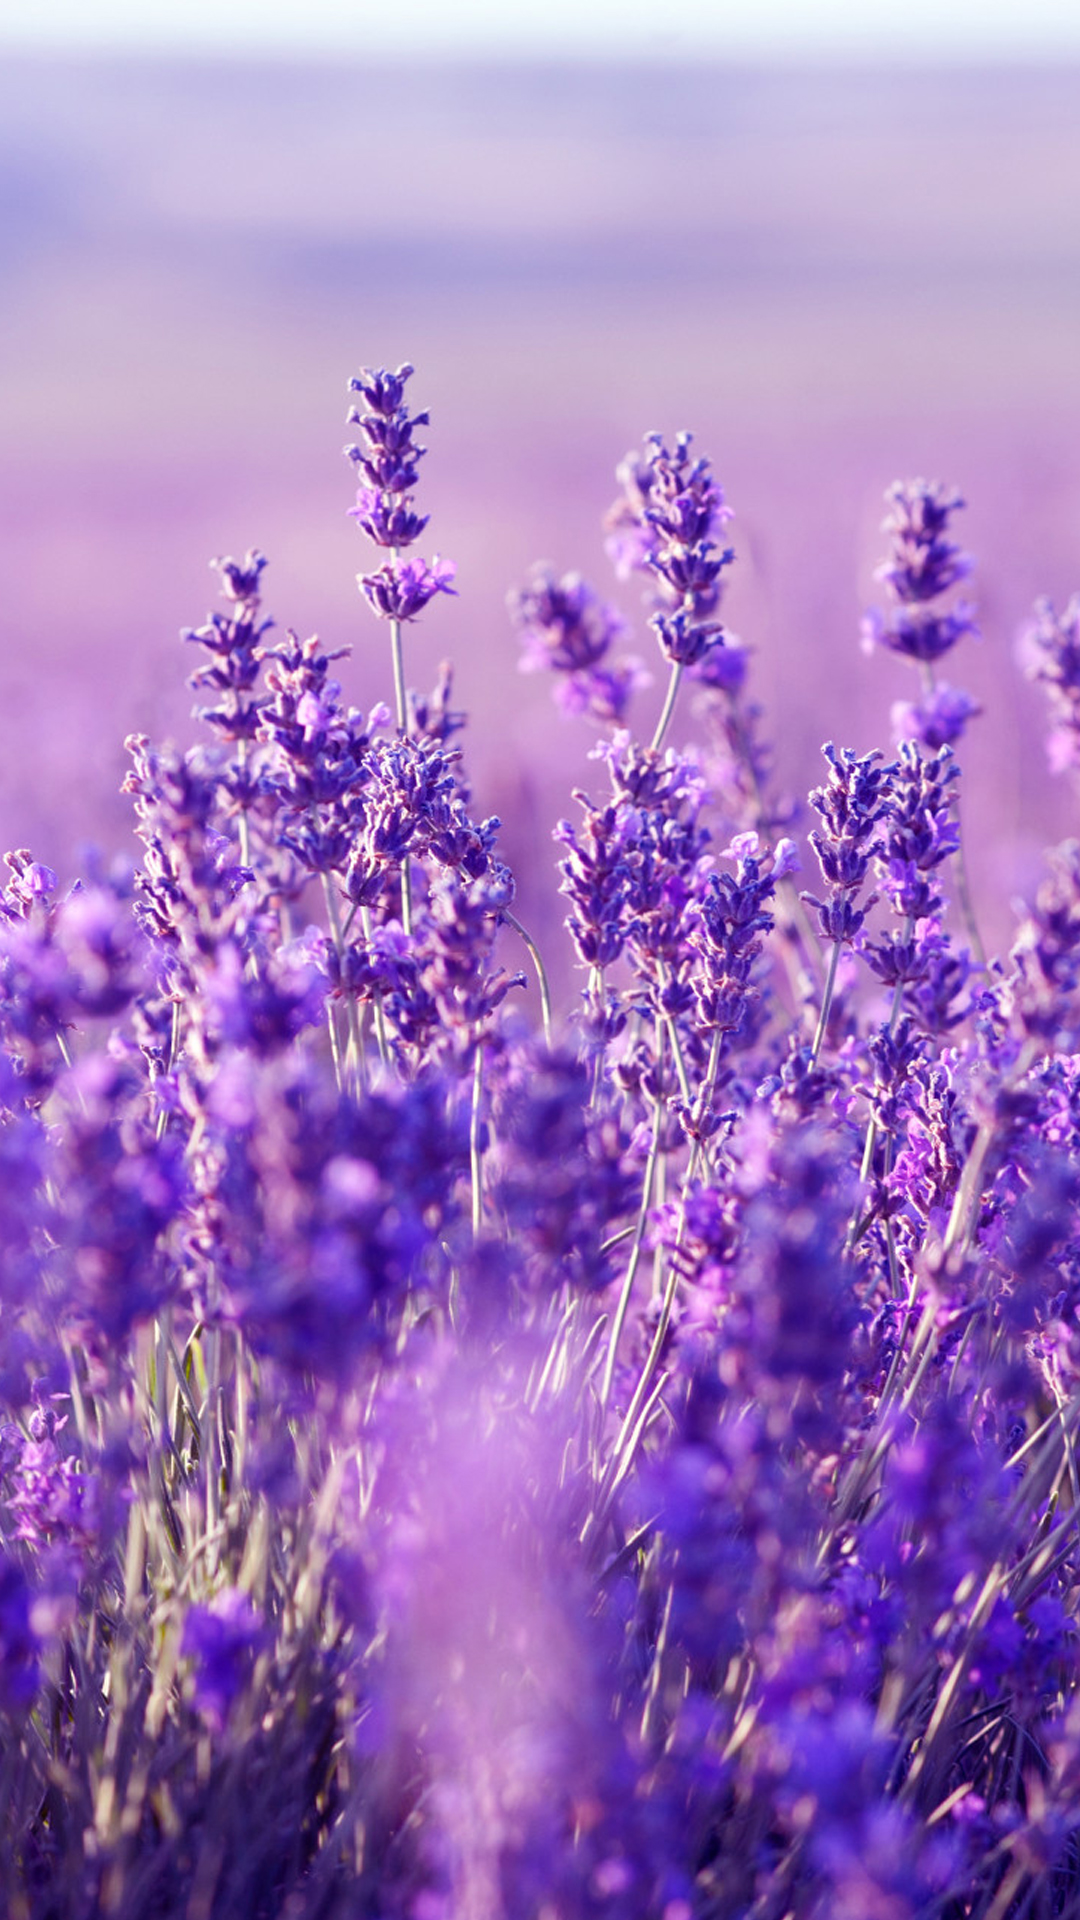 Beautiful Lavender Wallpaper HD Lavender Mobile 1080x1920